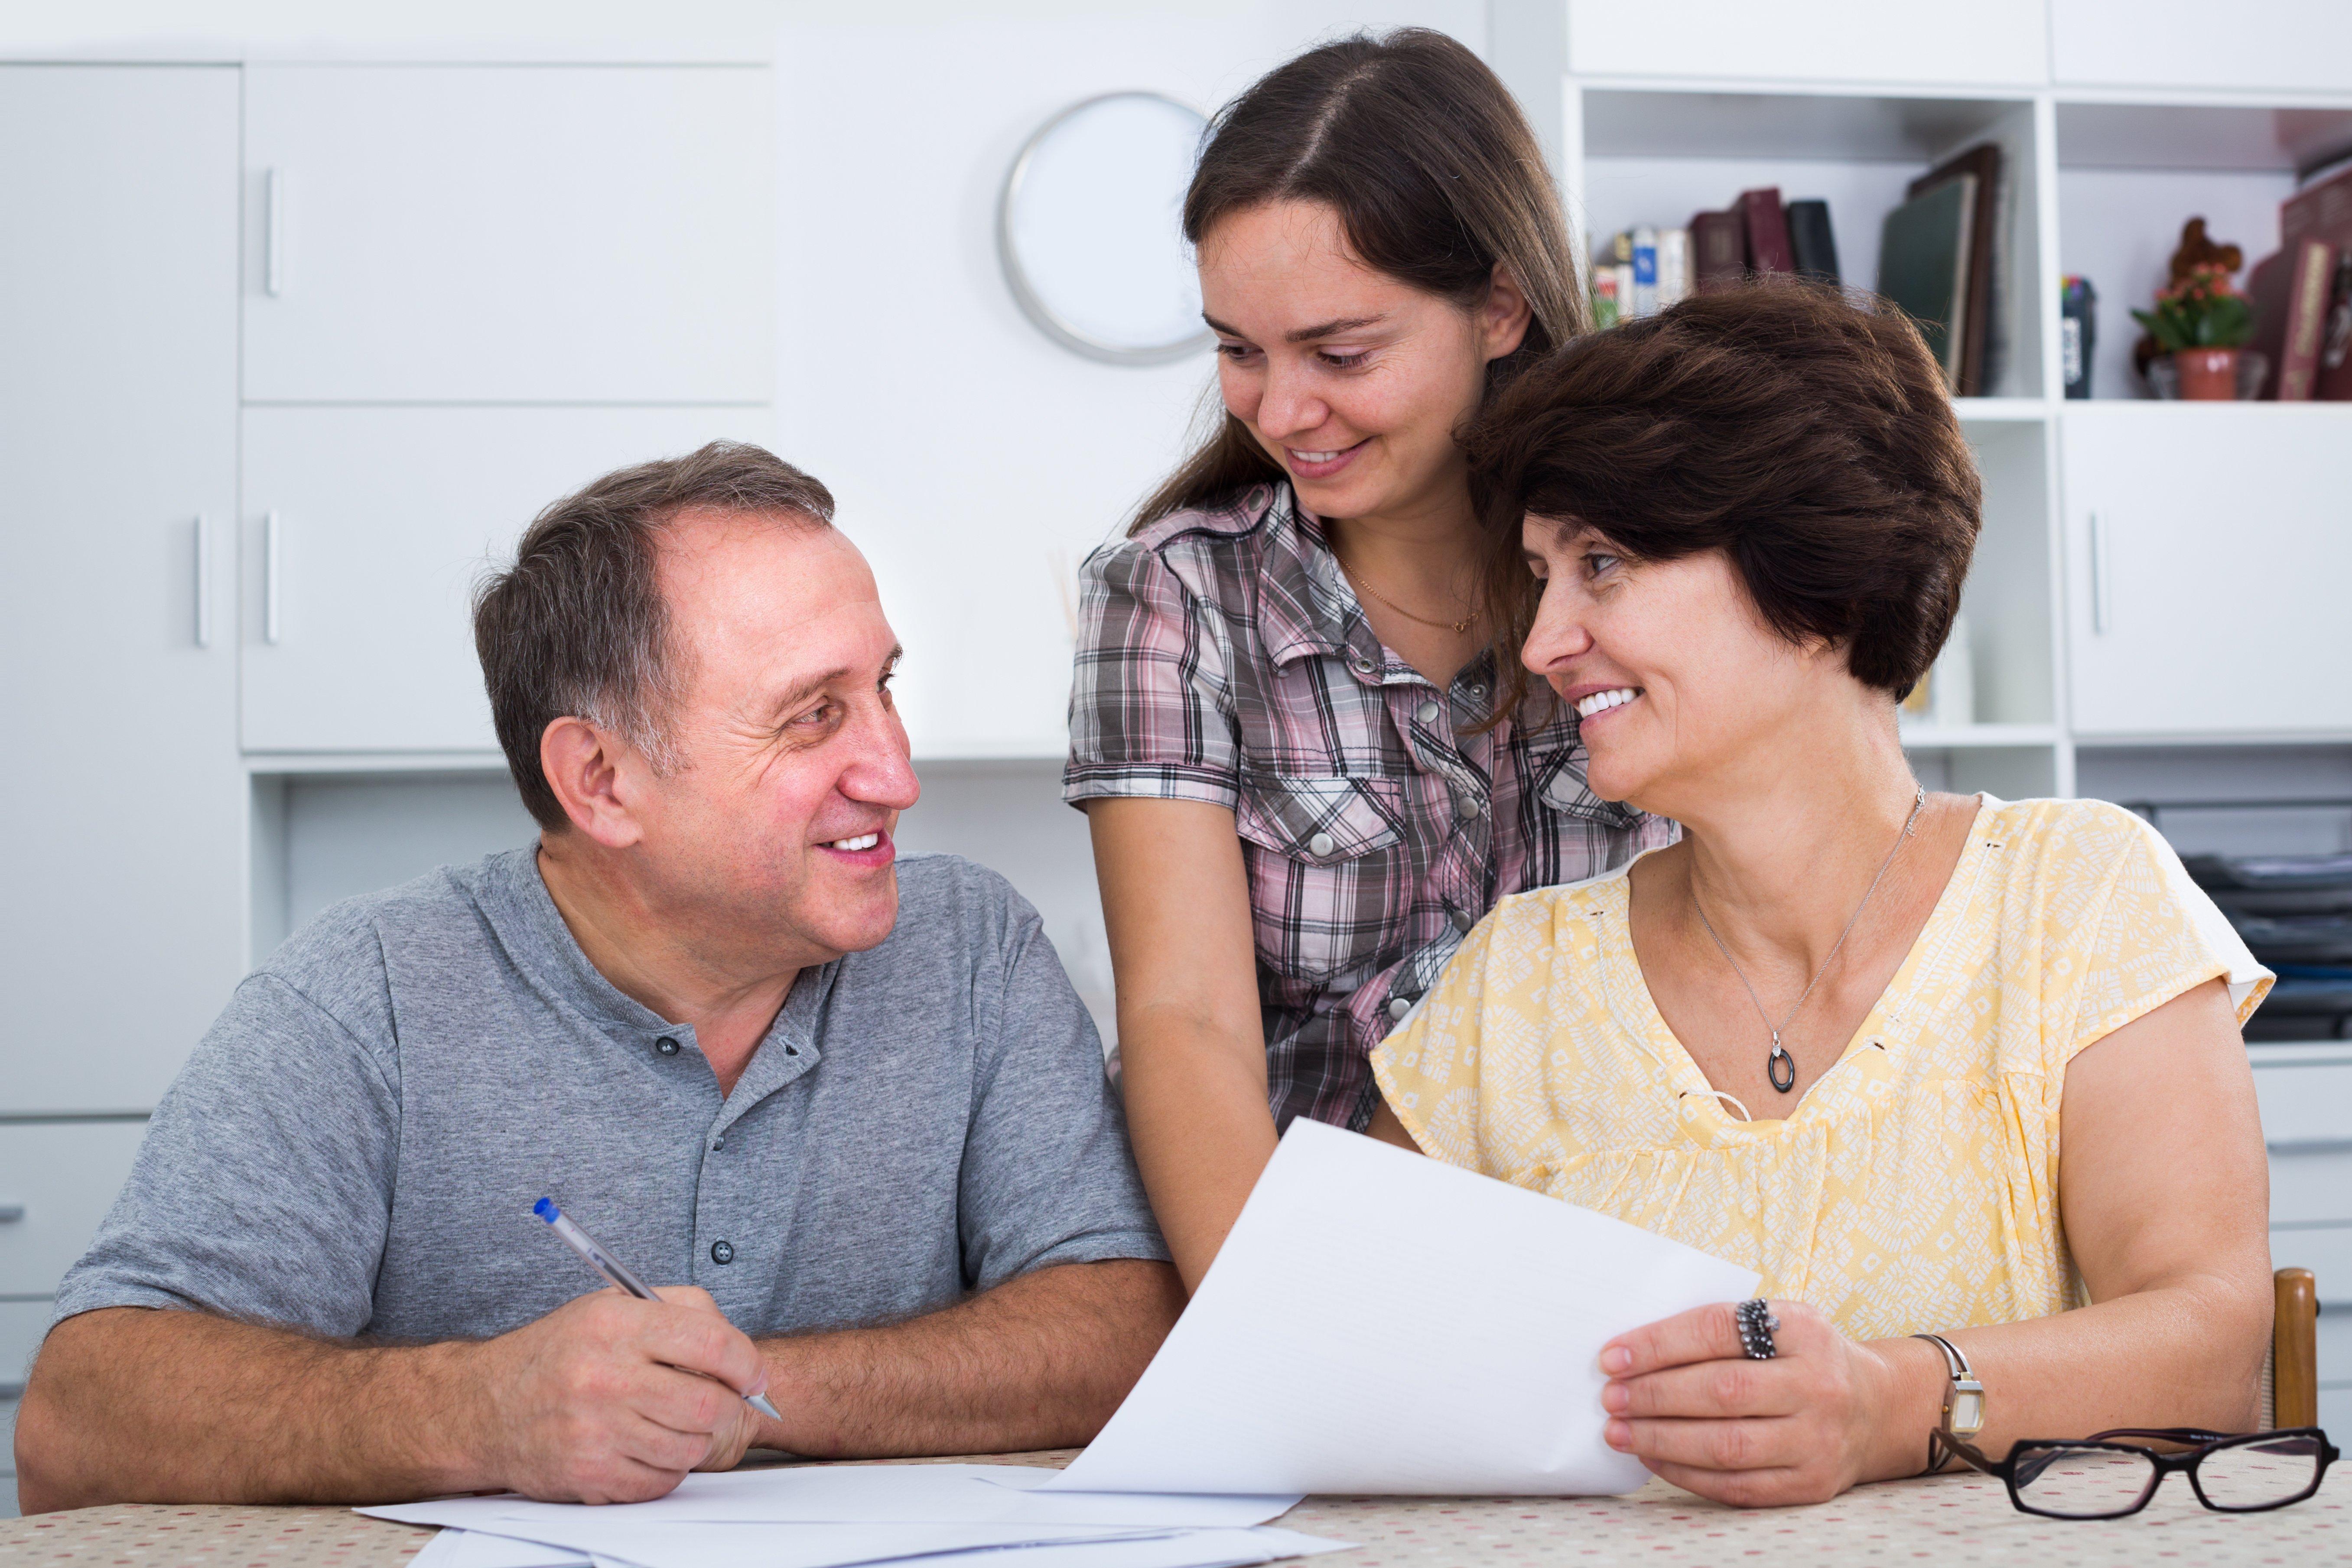 Parents college cost talk